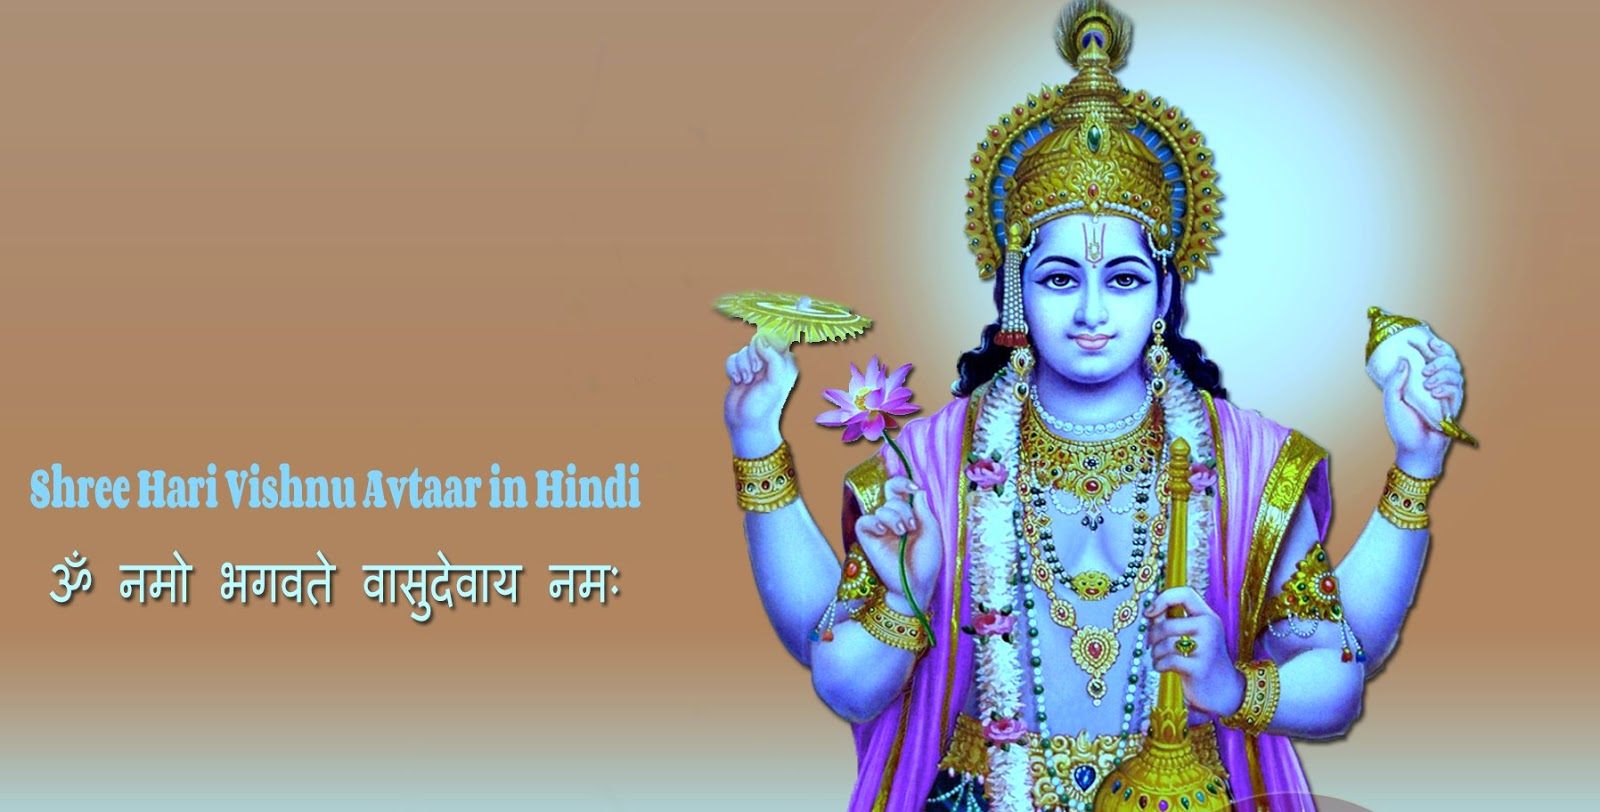 Shree Vishnu Avtaar - Shree Vishnu Different names , 108 names of shree hari vishnu